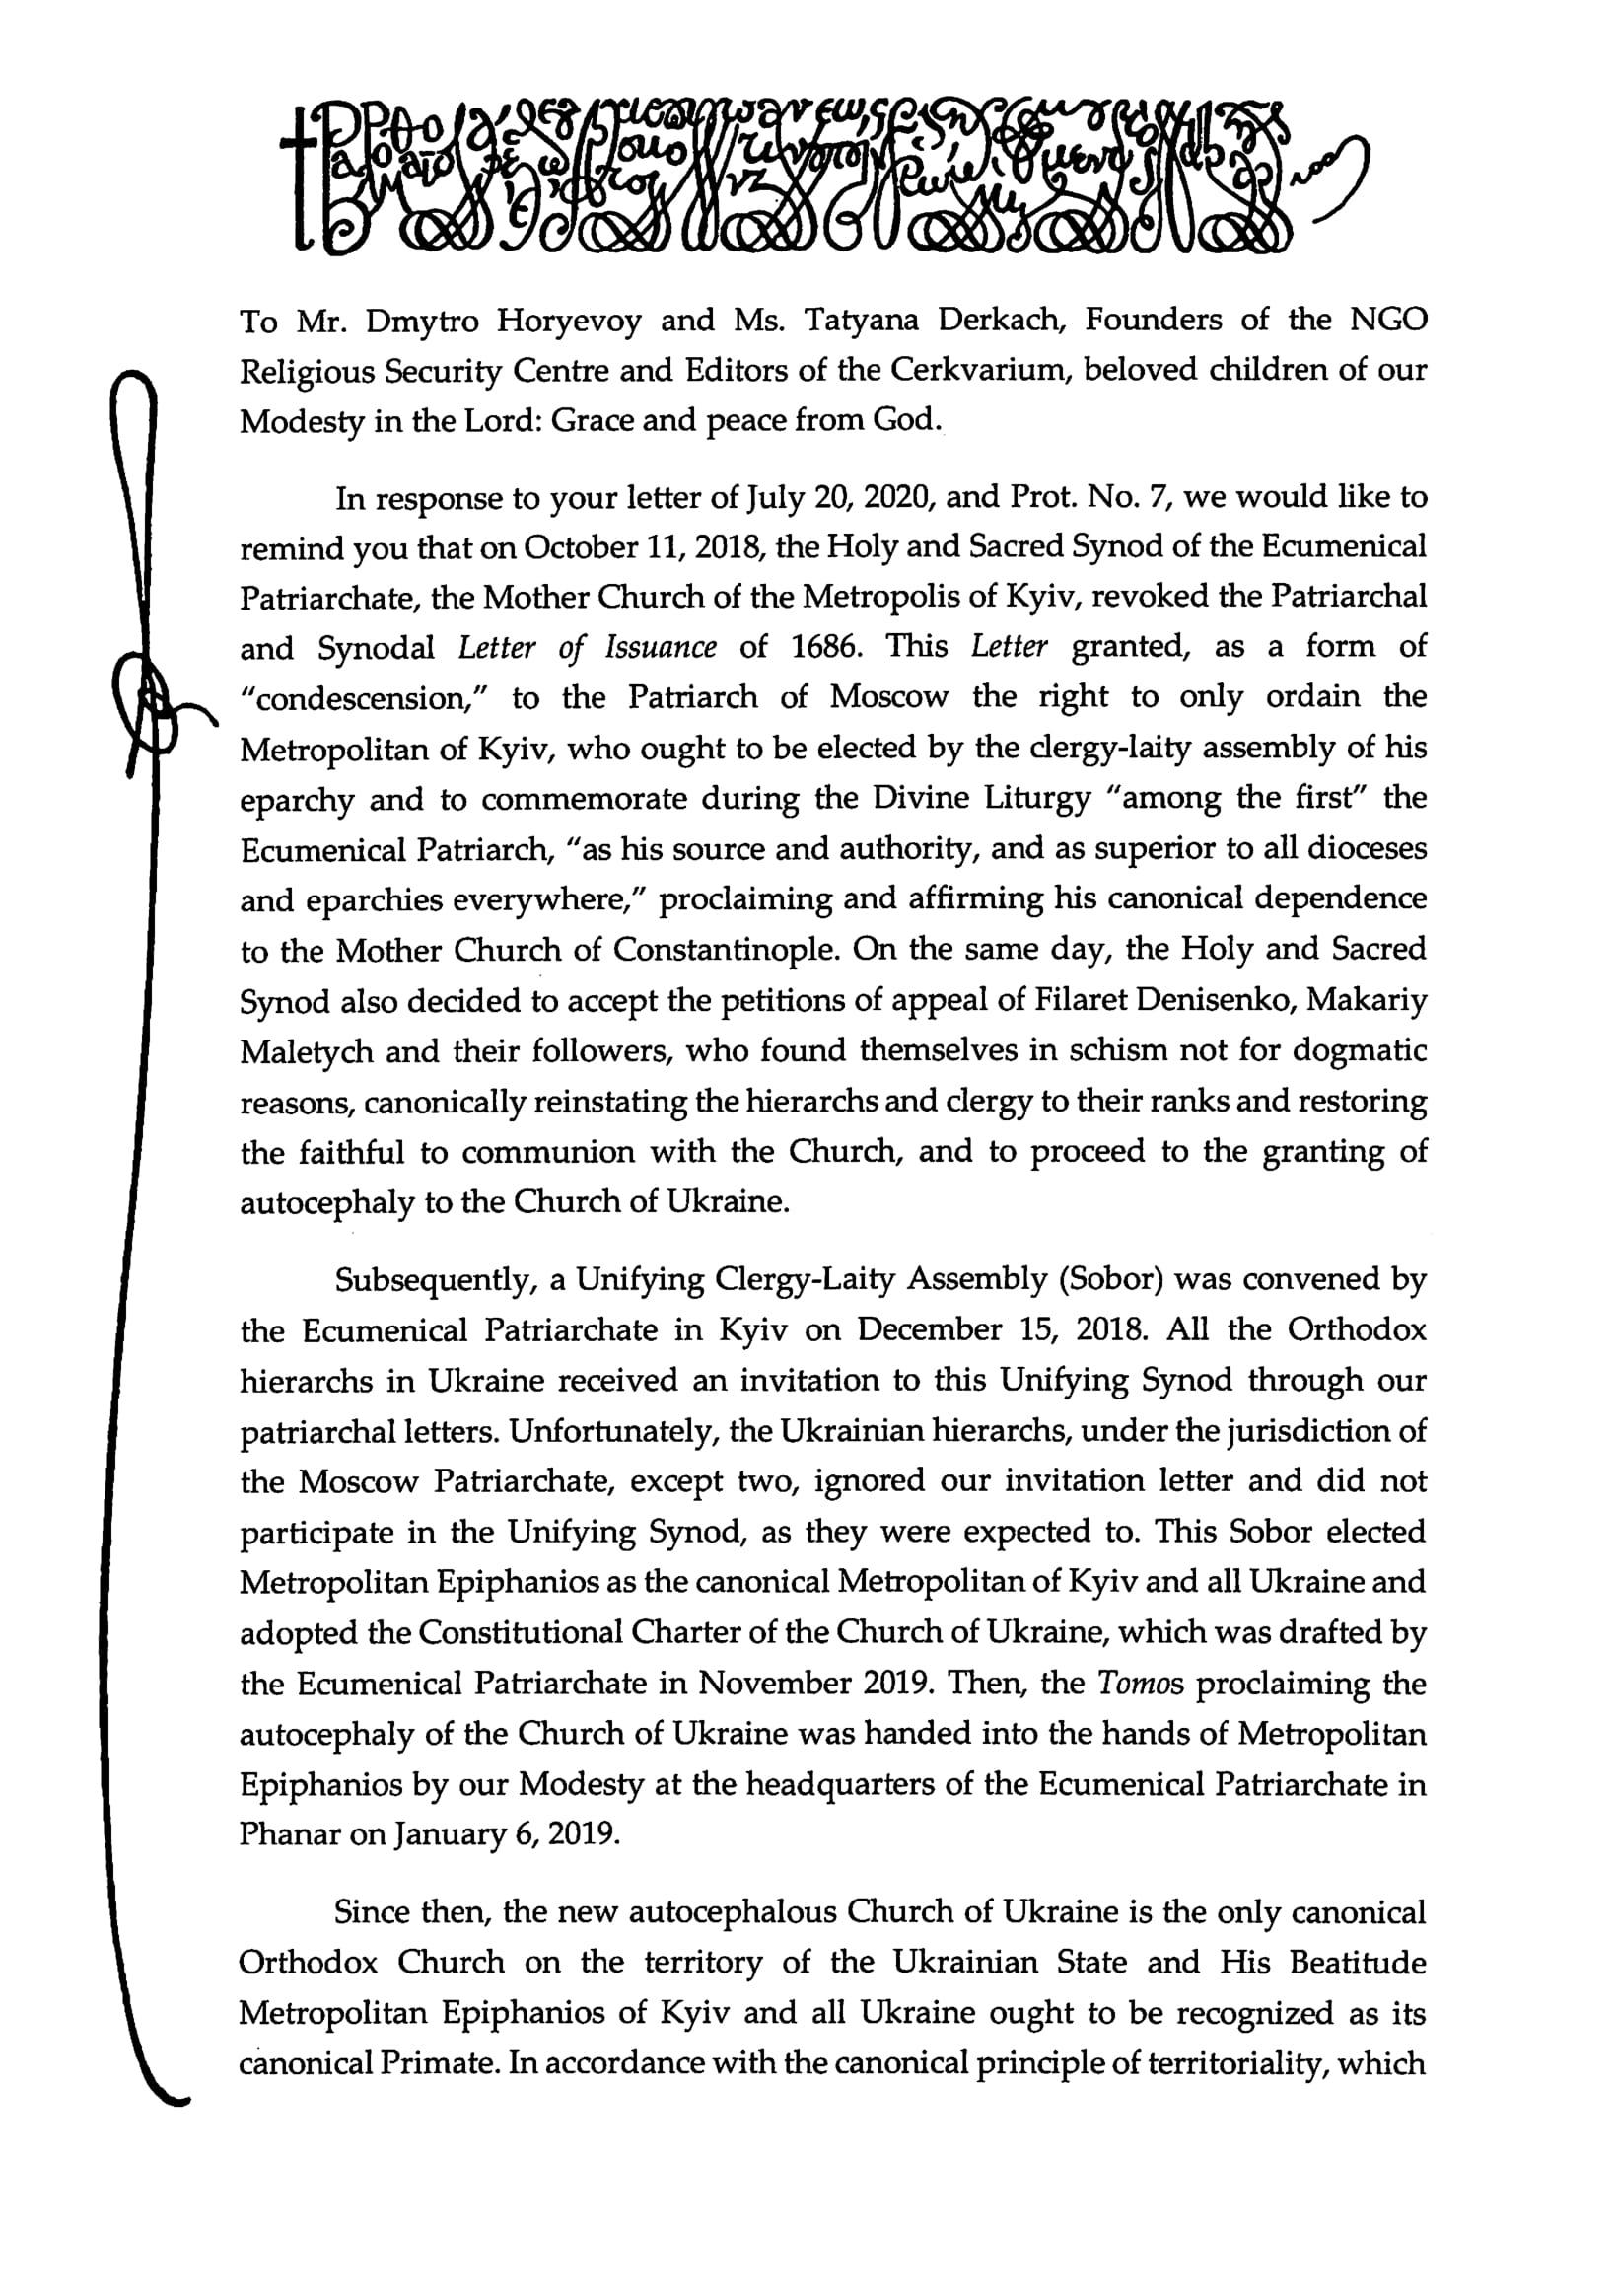 Patriarchal Reply-Cerkvarium-1